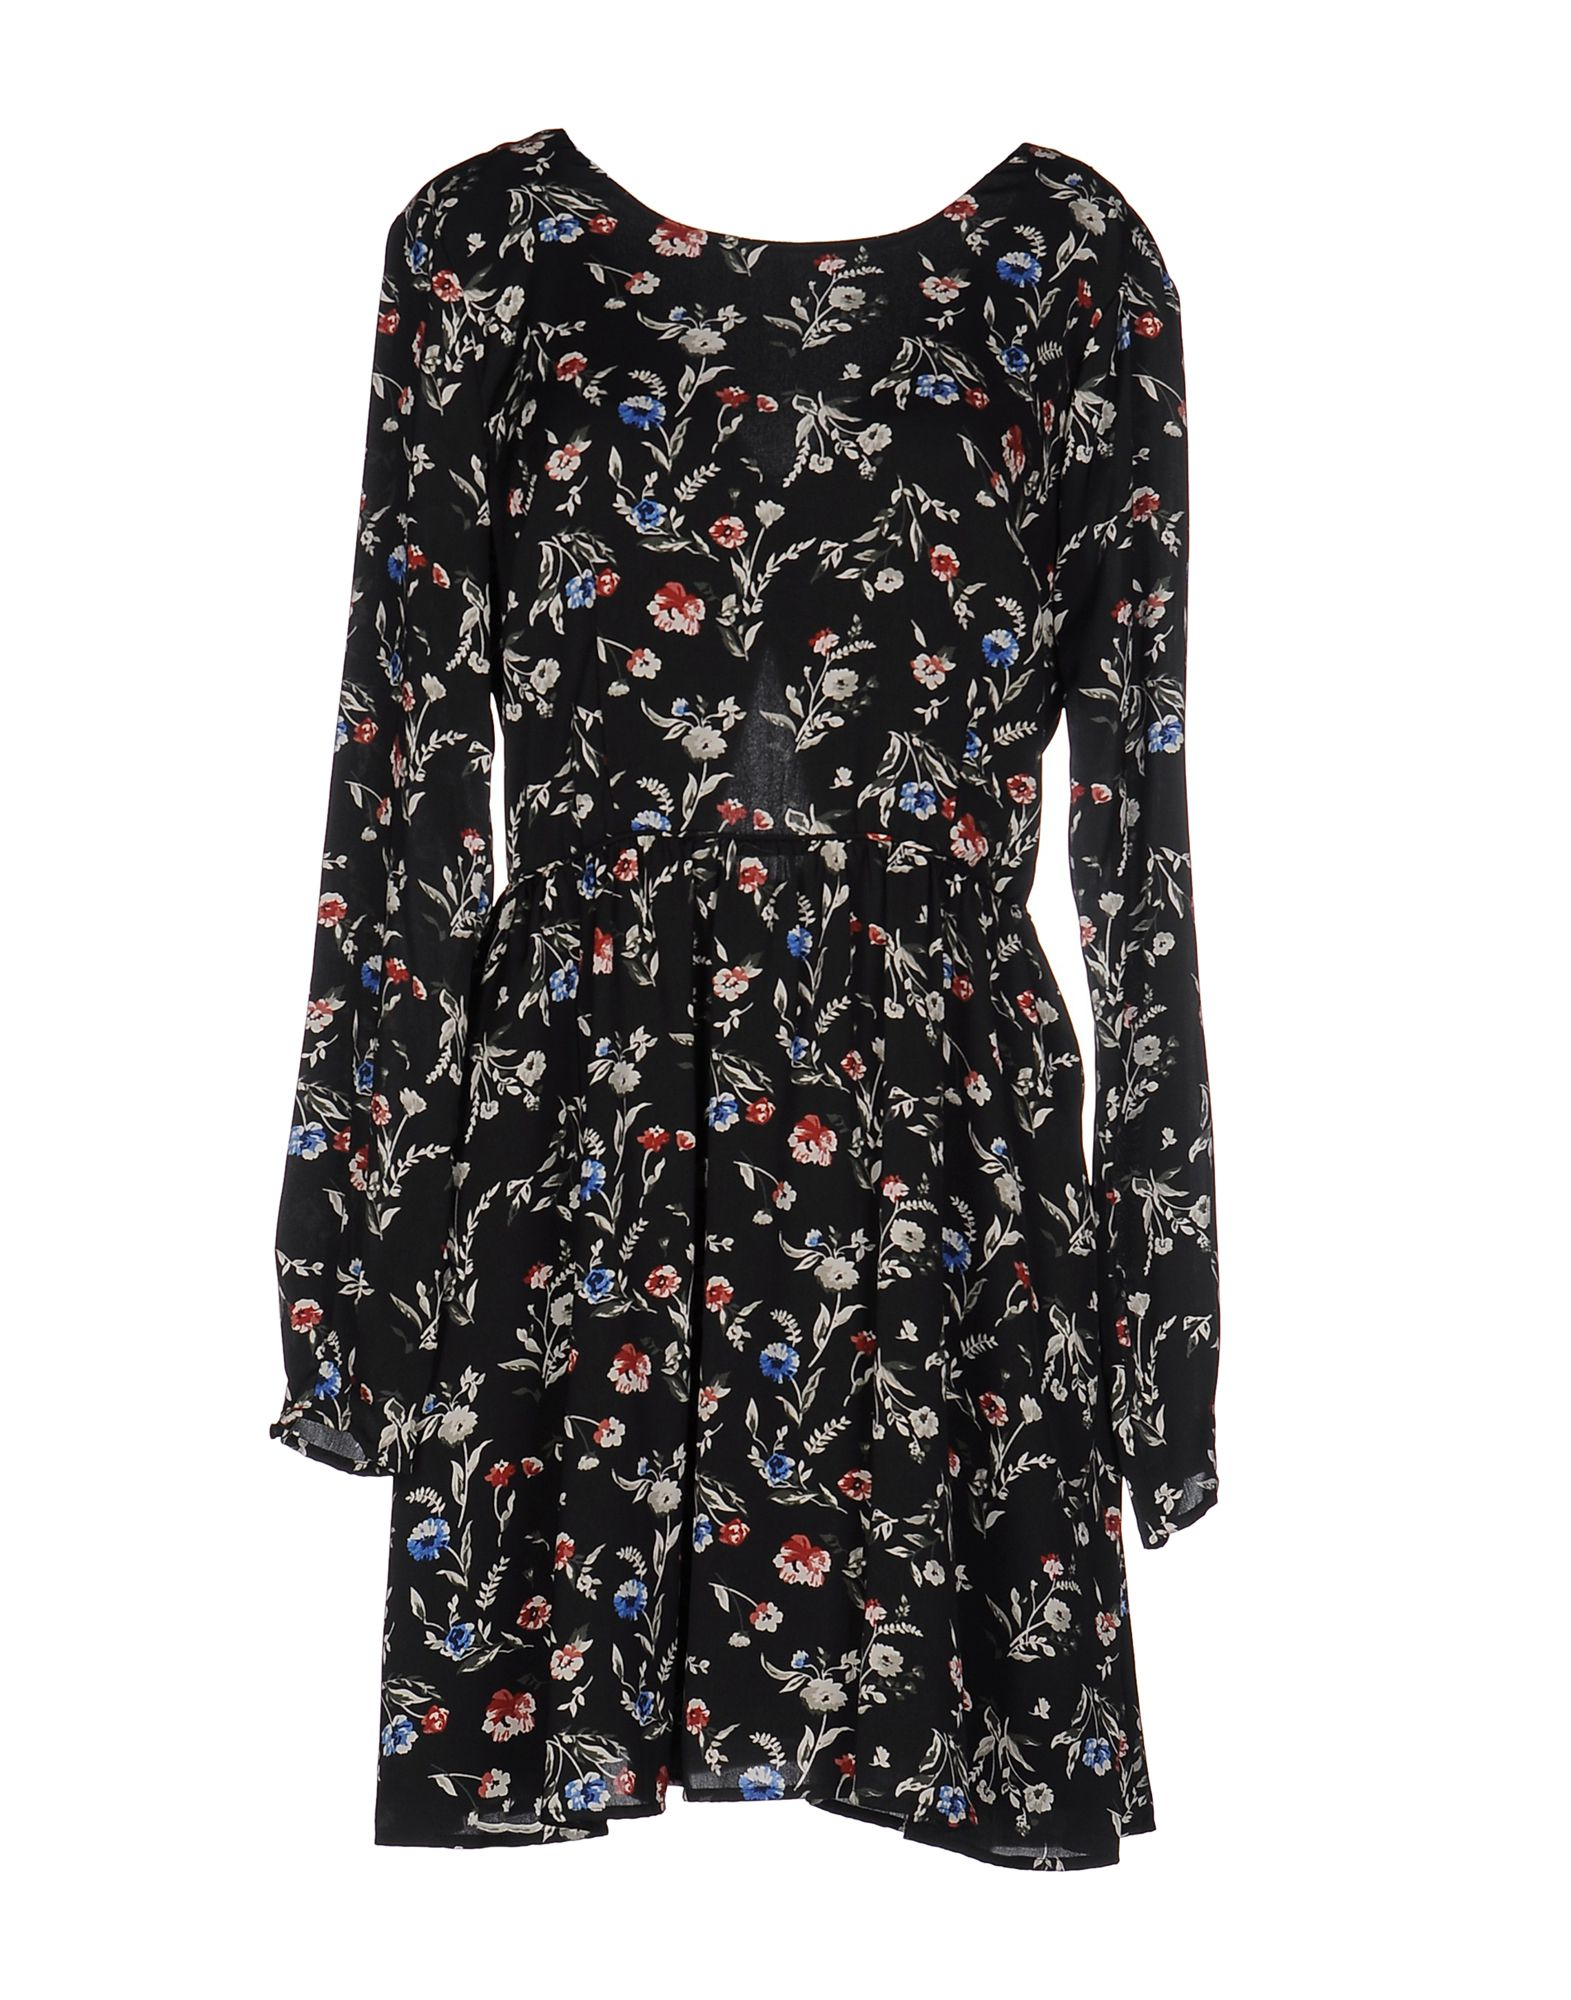 PEPE JEANS Короткое платье pepe jeans платье pepe jeans pl951690 0aa